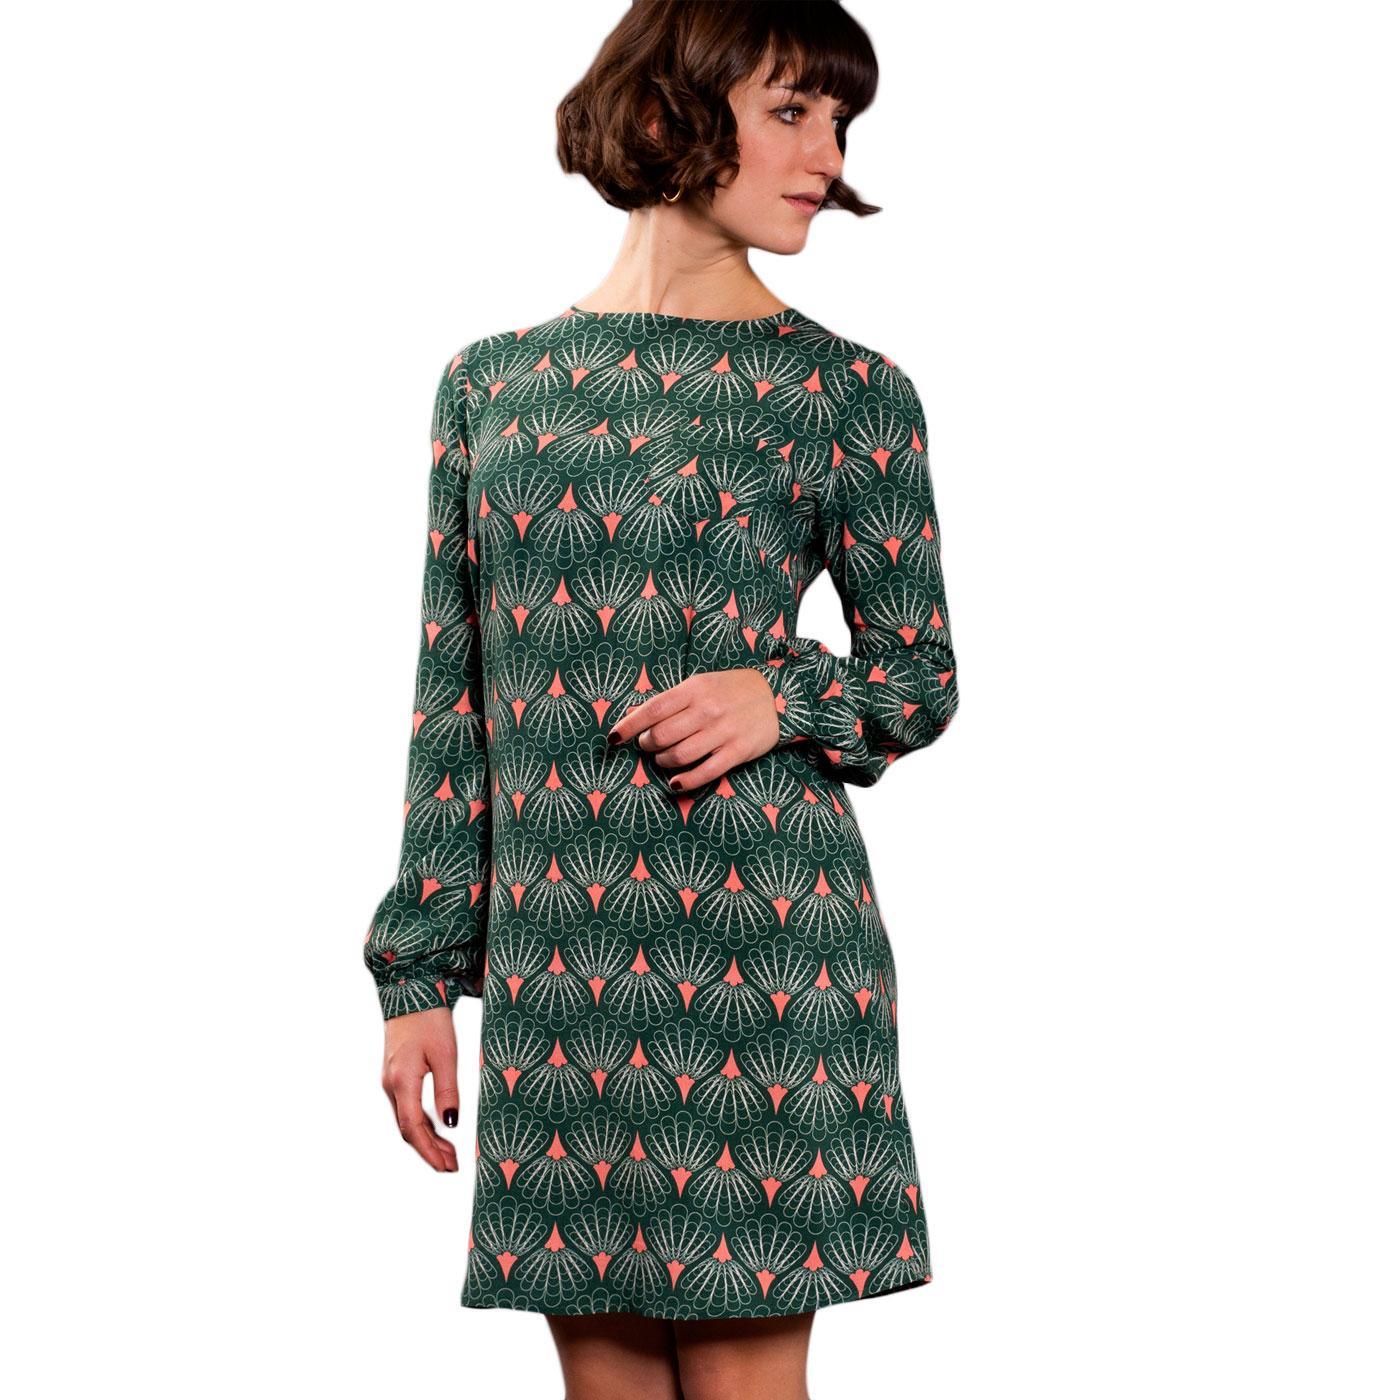 Art Lover MADEMOISELLE YEYE Retro 60s Dress Green